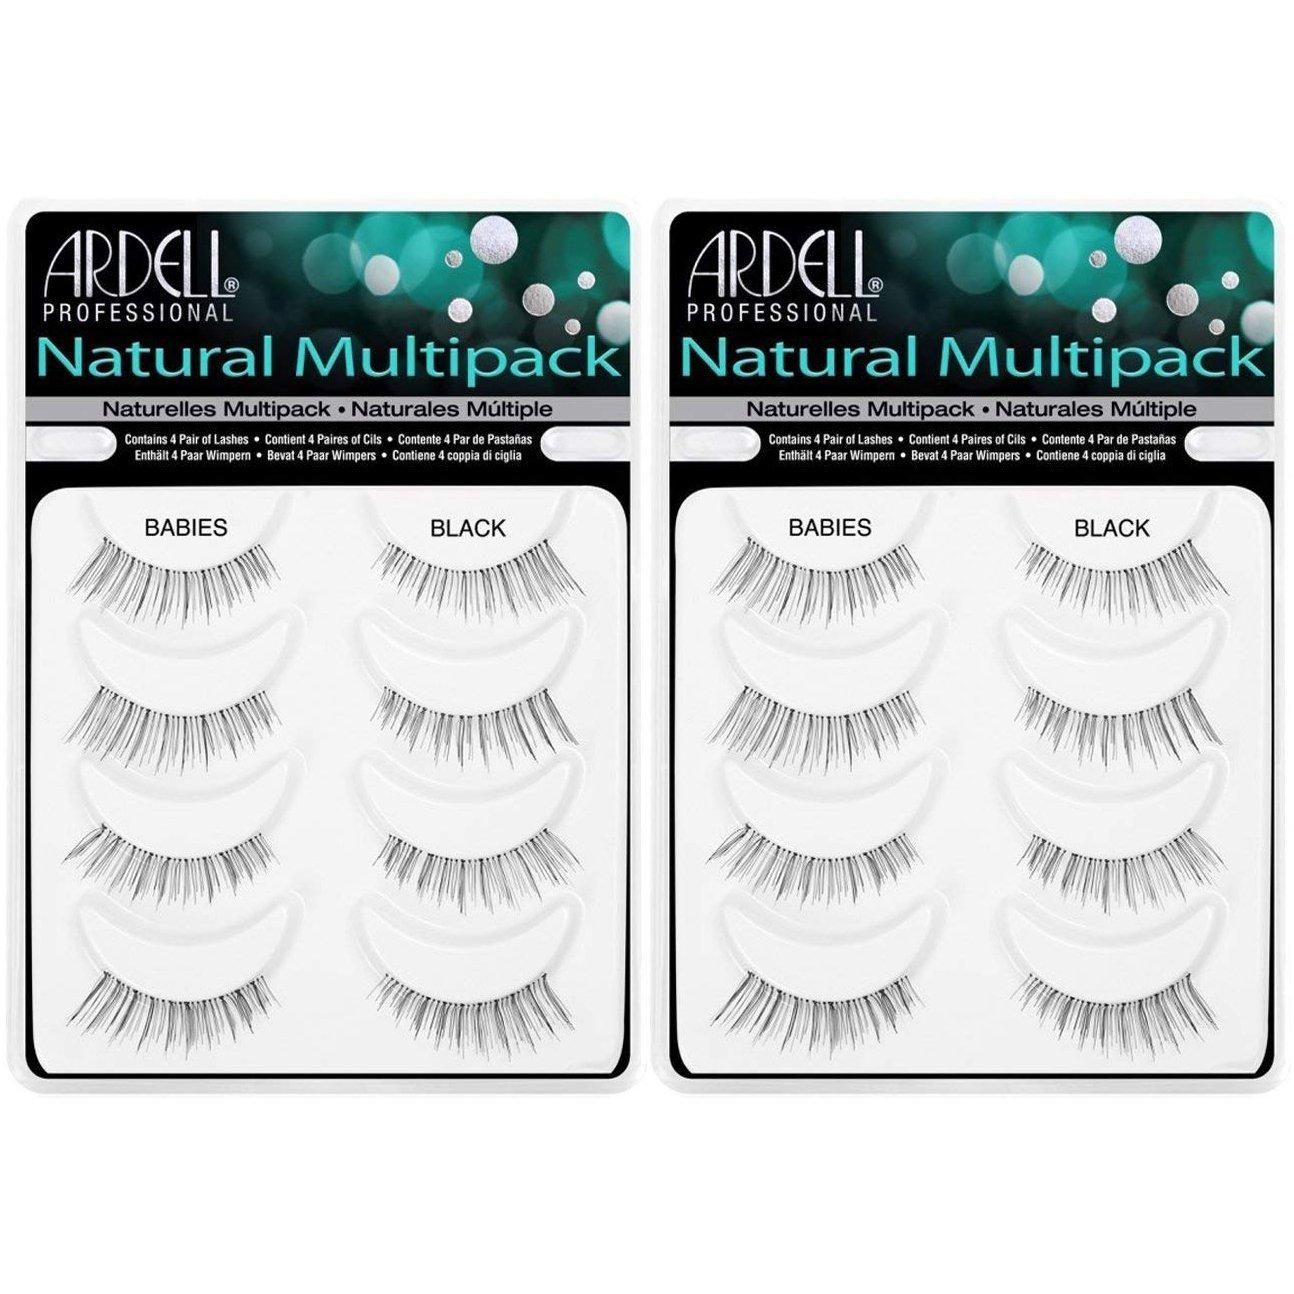 7b2e24a3688 Amazon.com: Ardell Multipack Babies Fake Eyelashes (2-Pack): Beauty